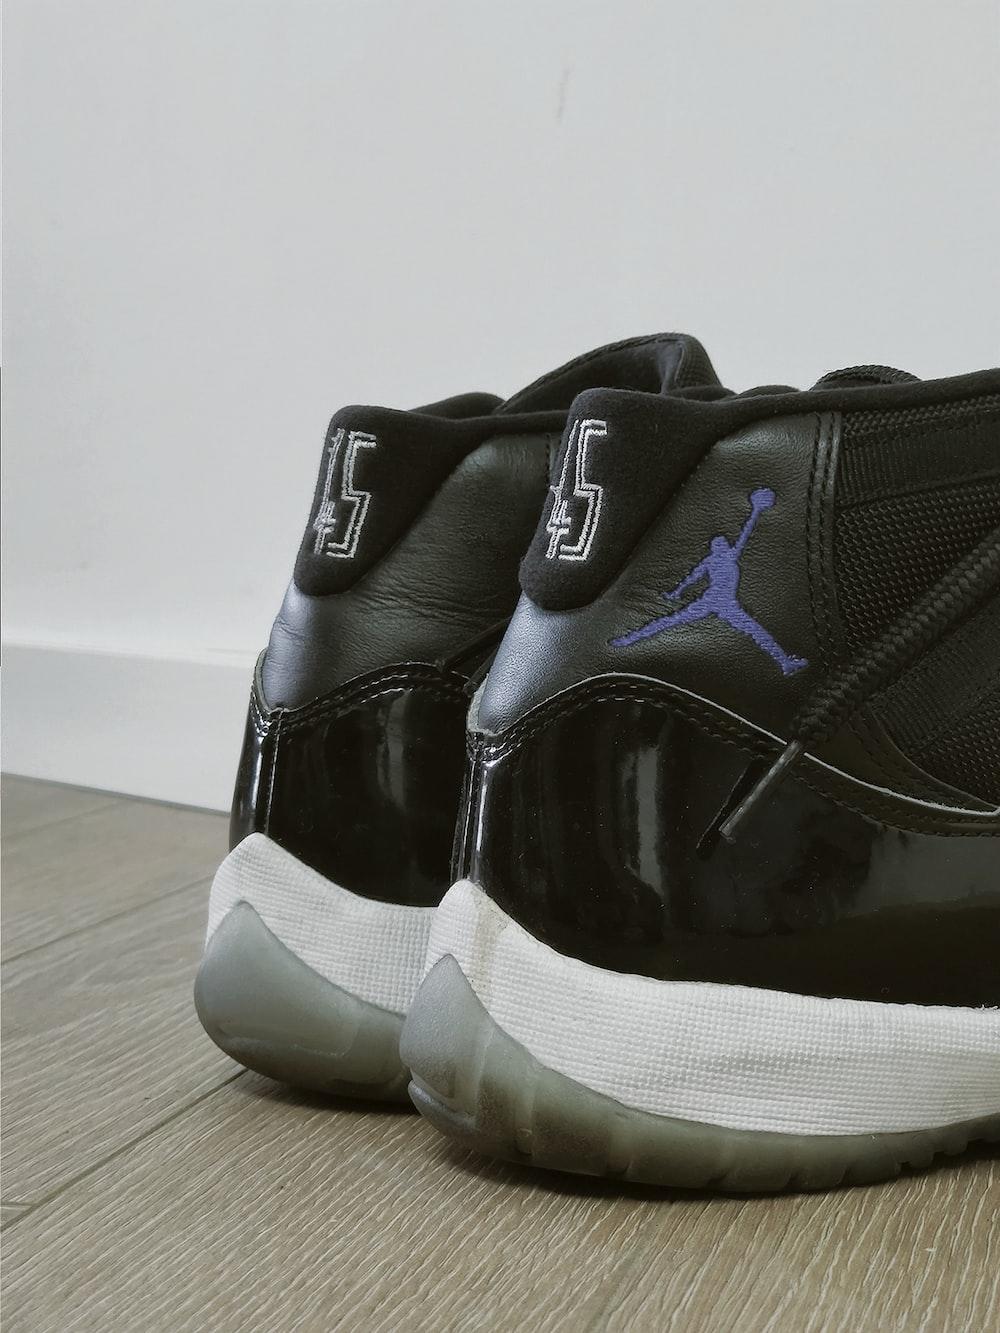 big discount sale retailer offer discounts pair of black Air Jordan basketball shoes photo – Free Apparel ...